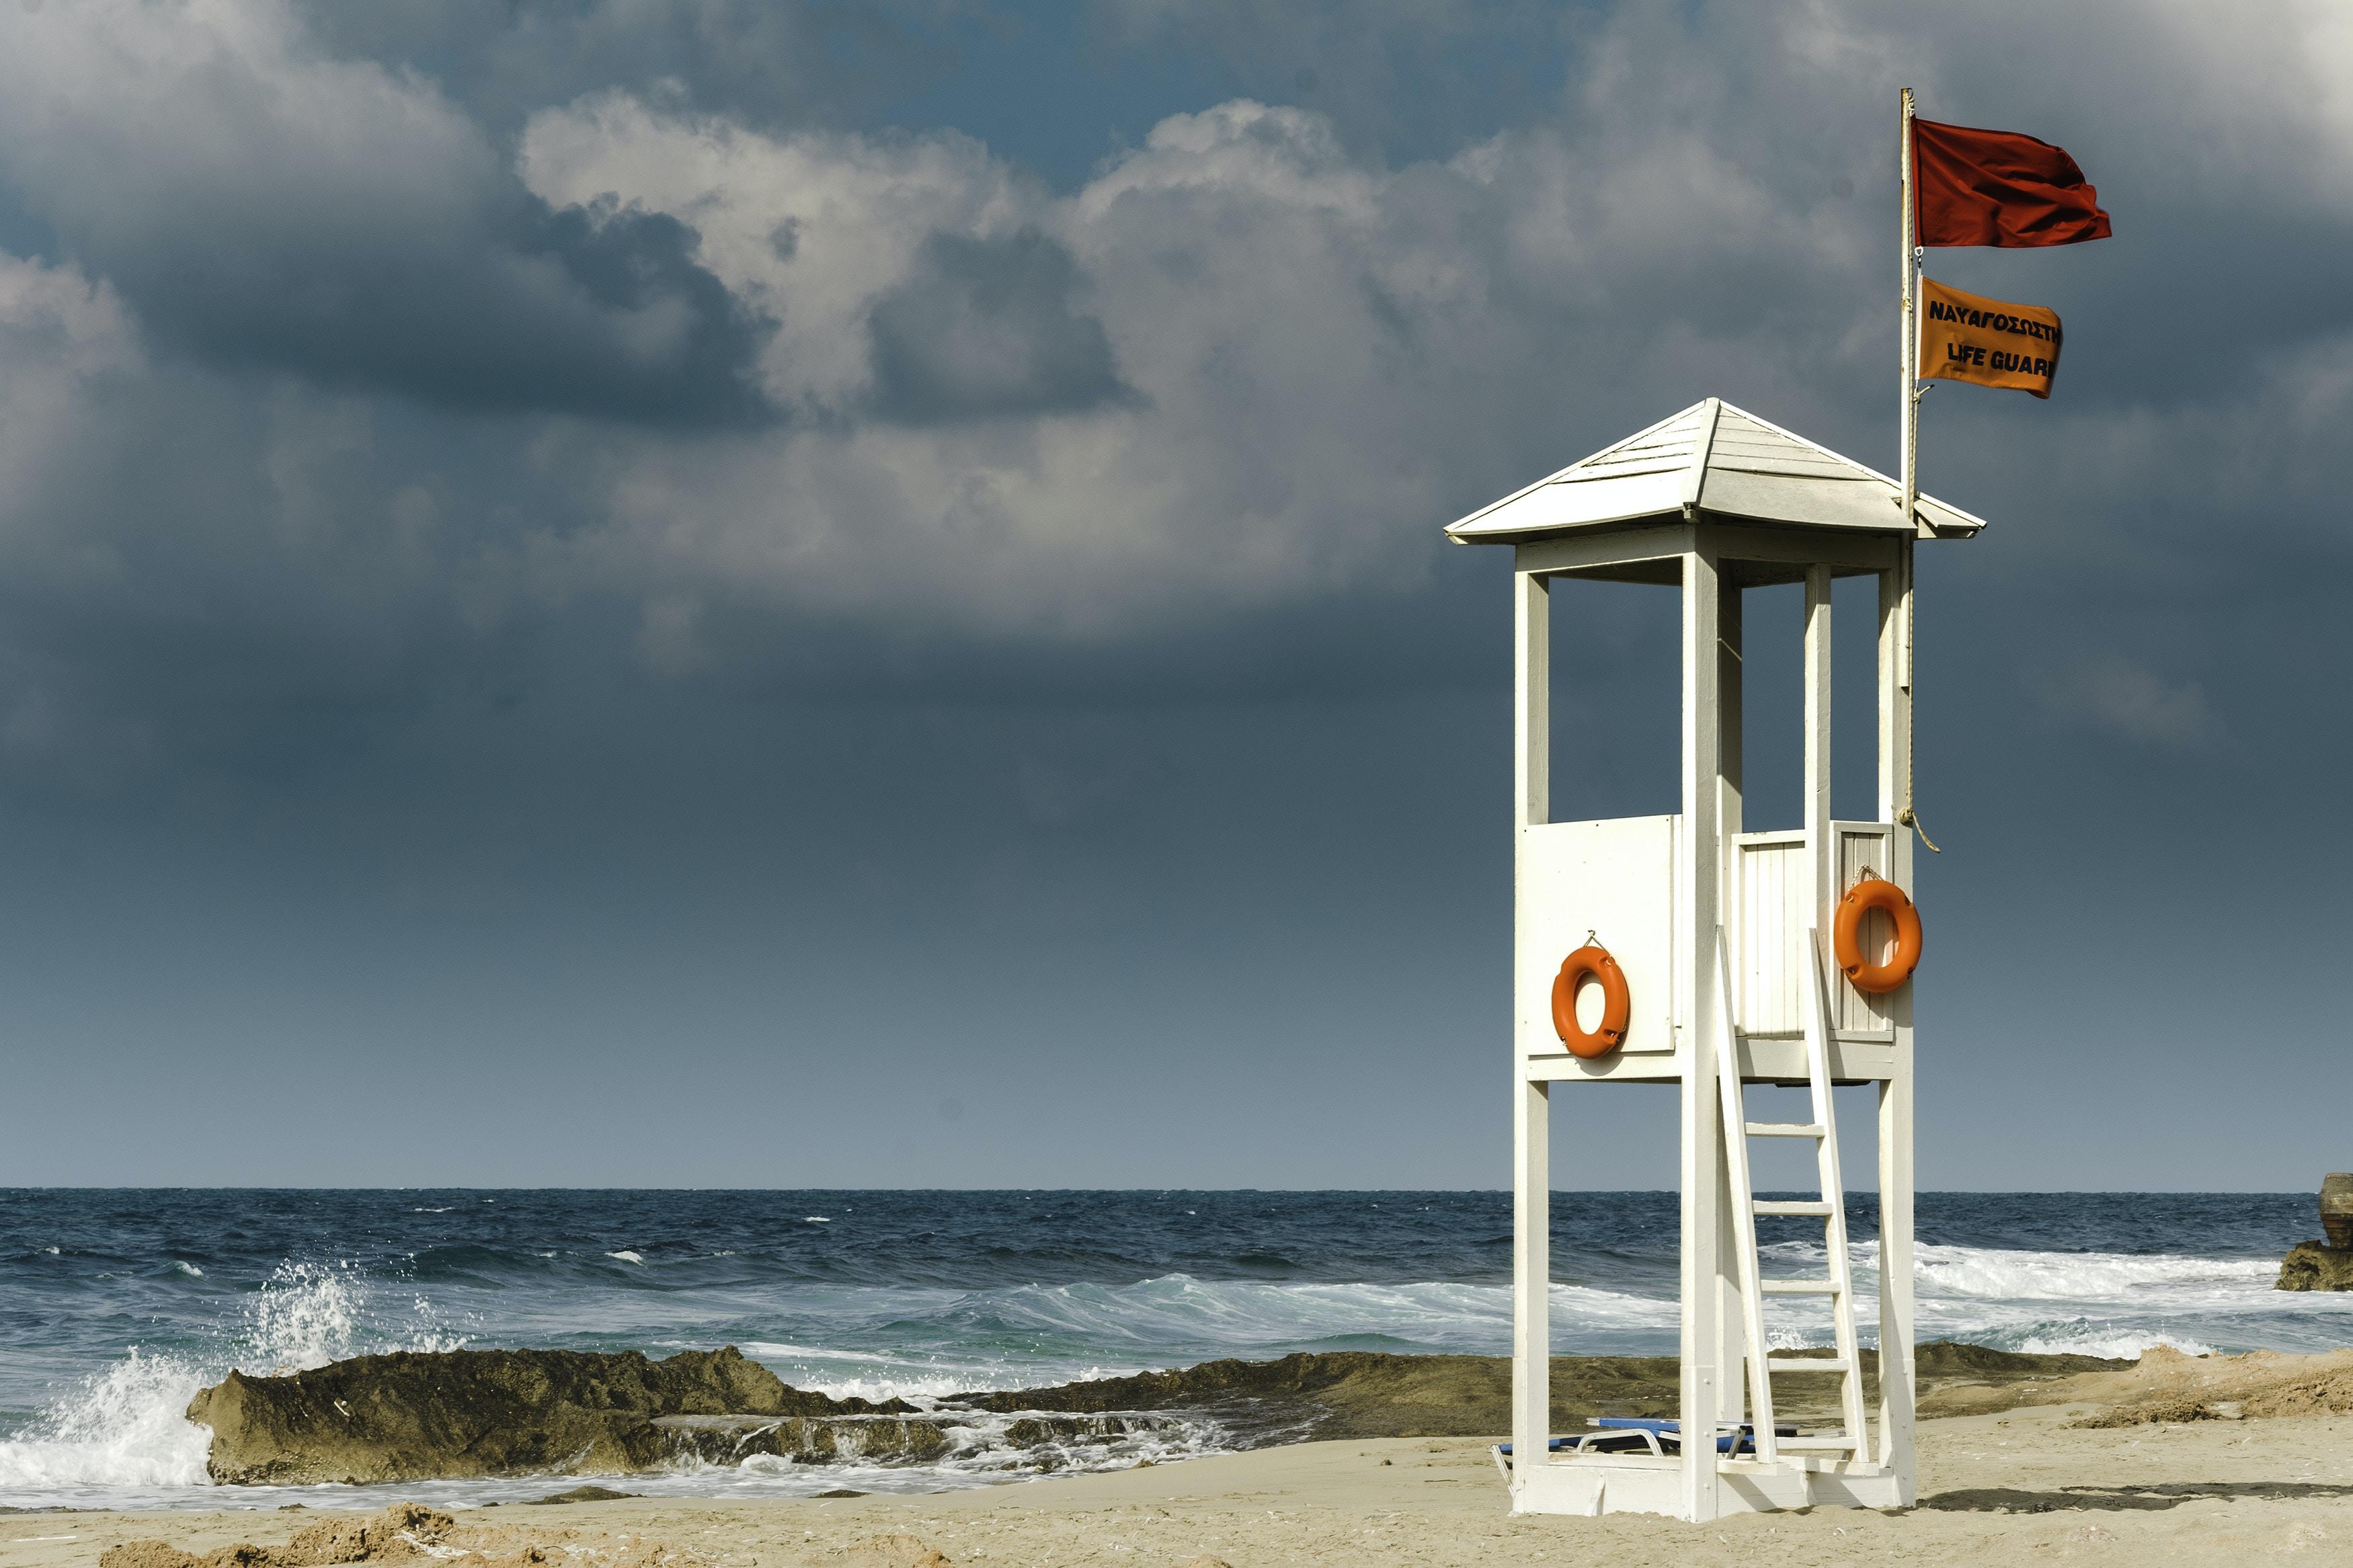 white wooden lifeguard house near seashore